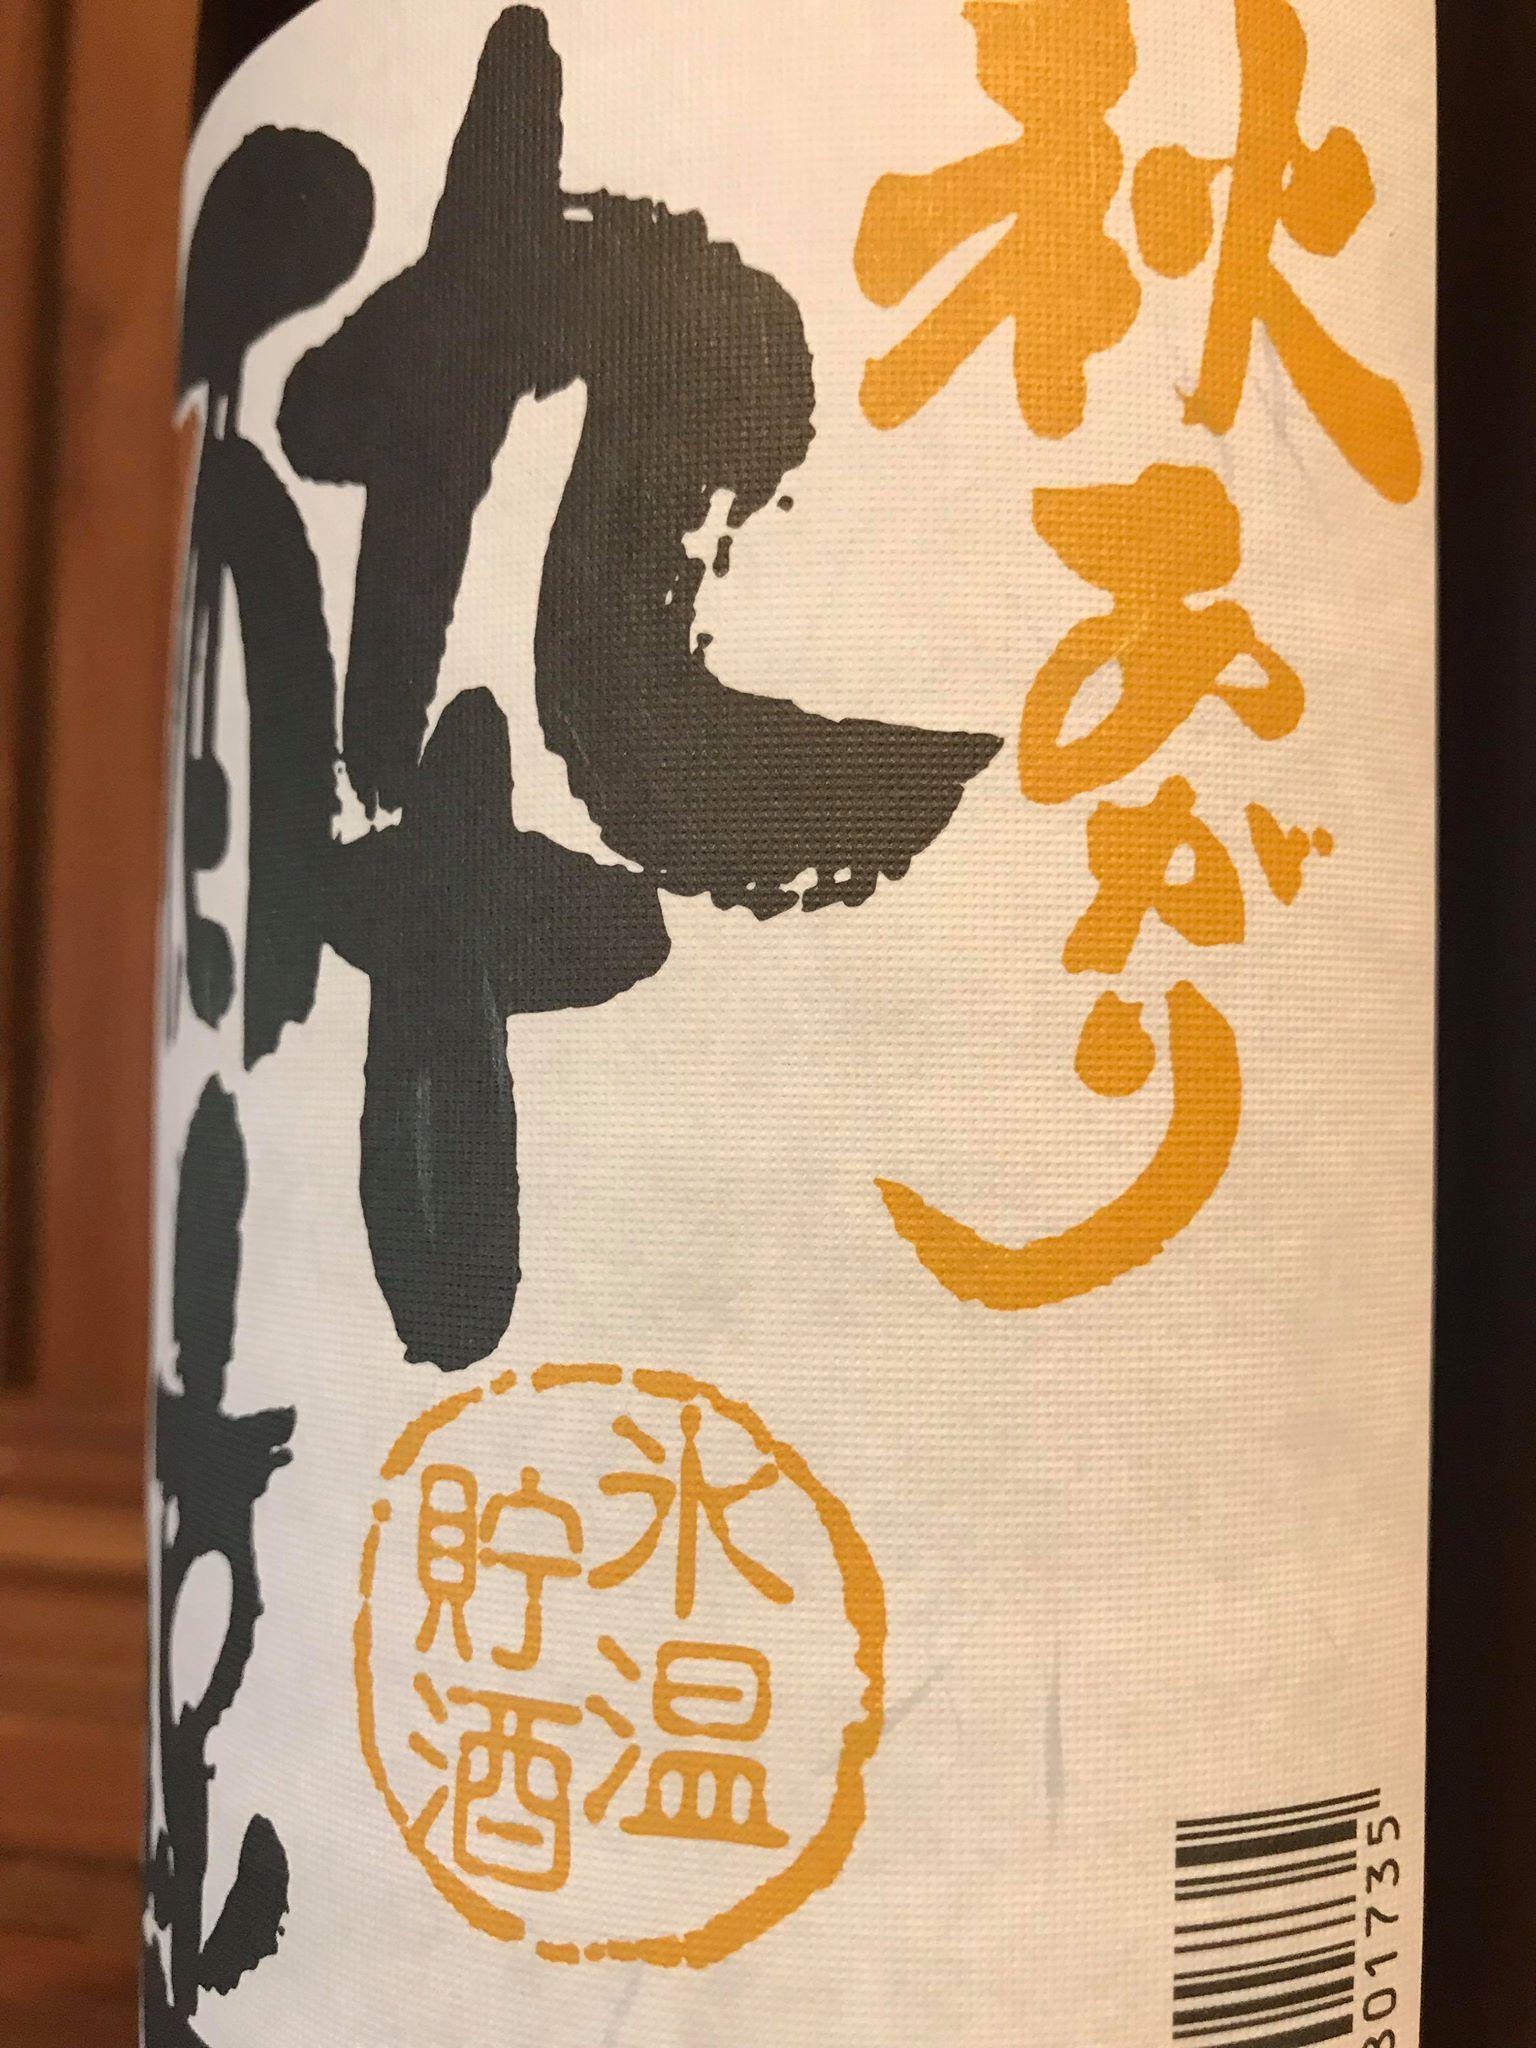 【日本酒】酔鯨 吟麗 純米吟醸 秋あがり 蔵元氷温貯蔵熟成ver 限定 29BY_e0173738_18542847.jpg